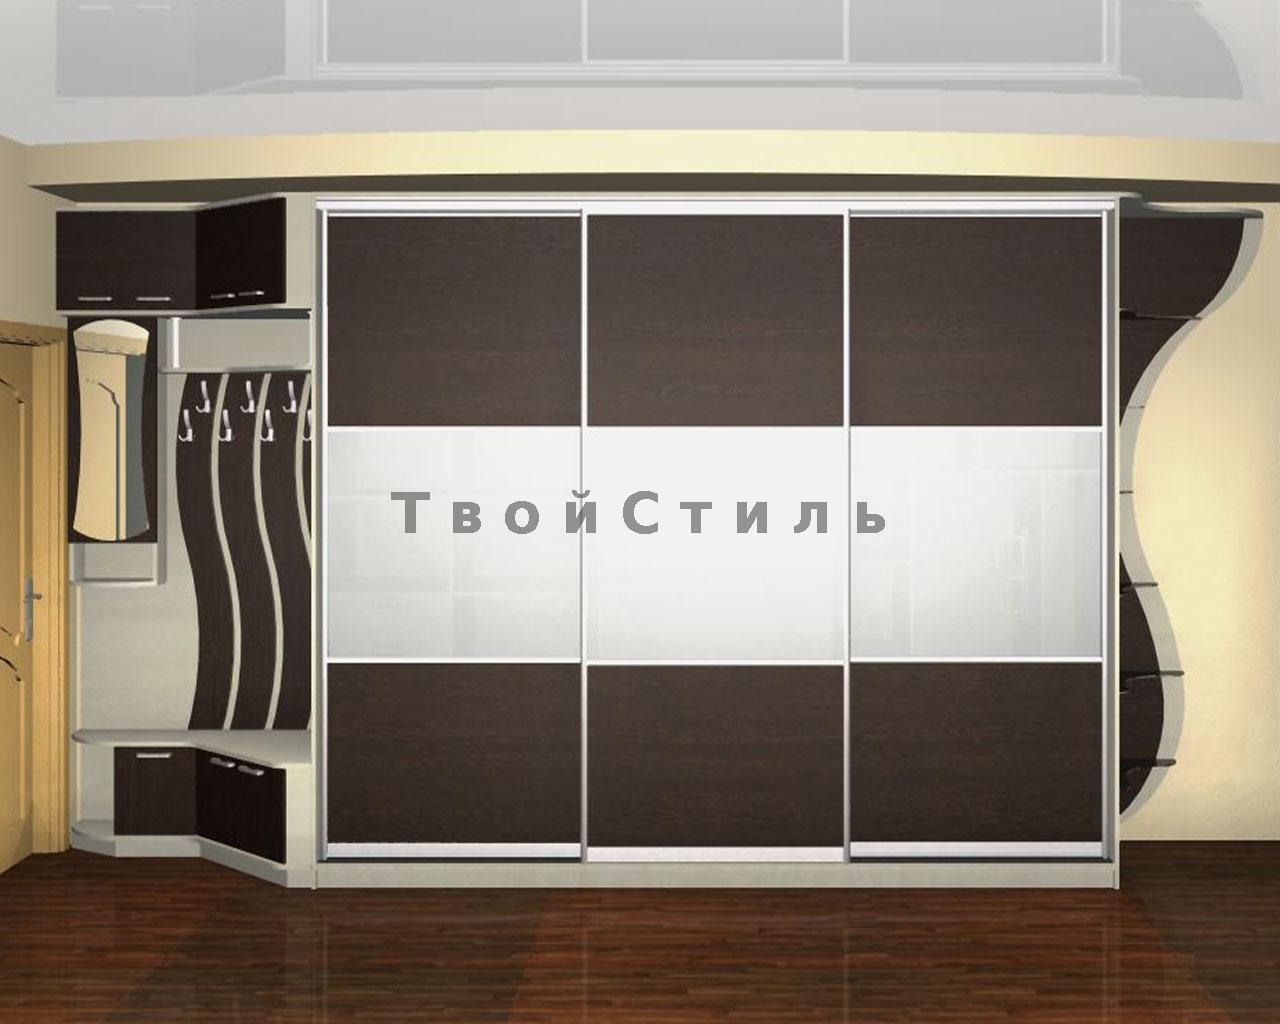 Шкафы-купе в прихожую на заказ зеленоград, сходня, москва.